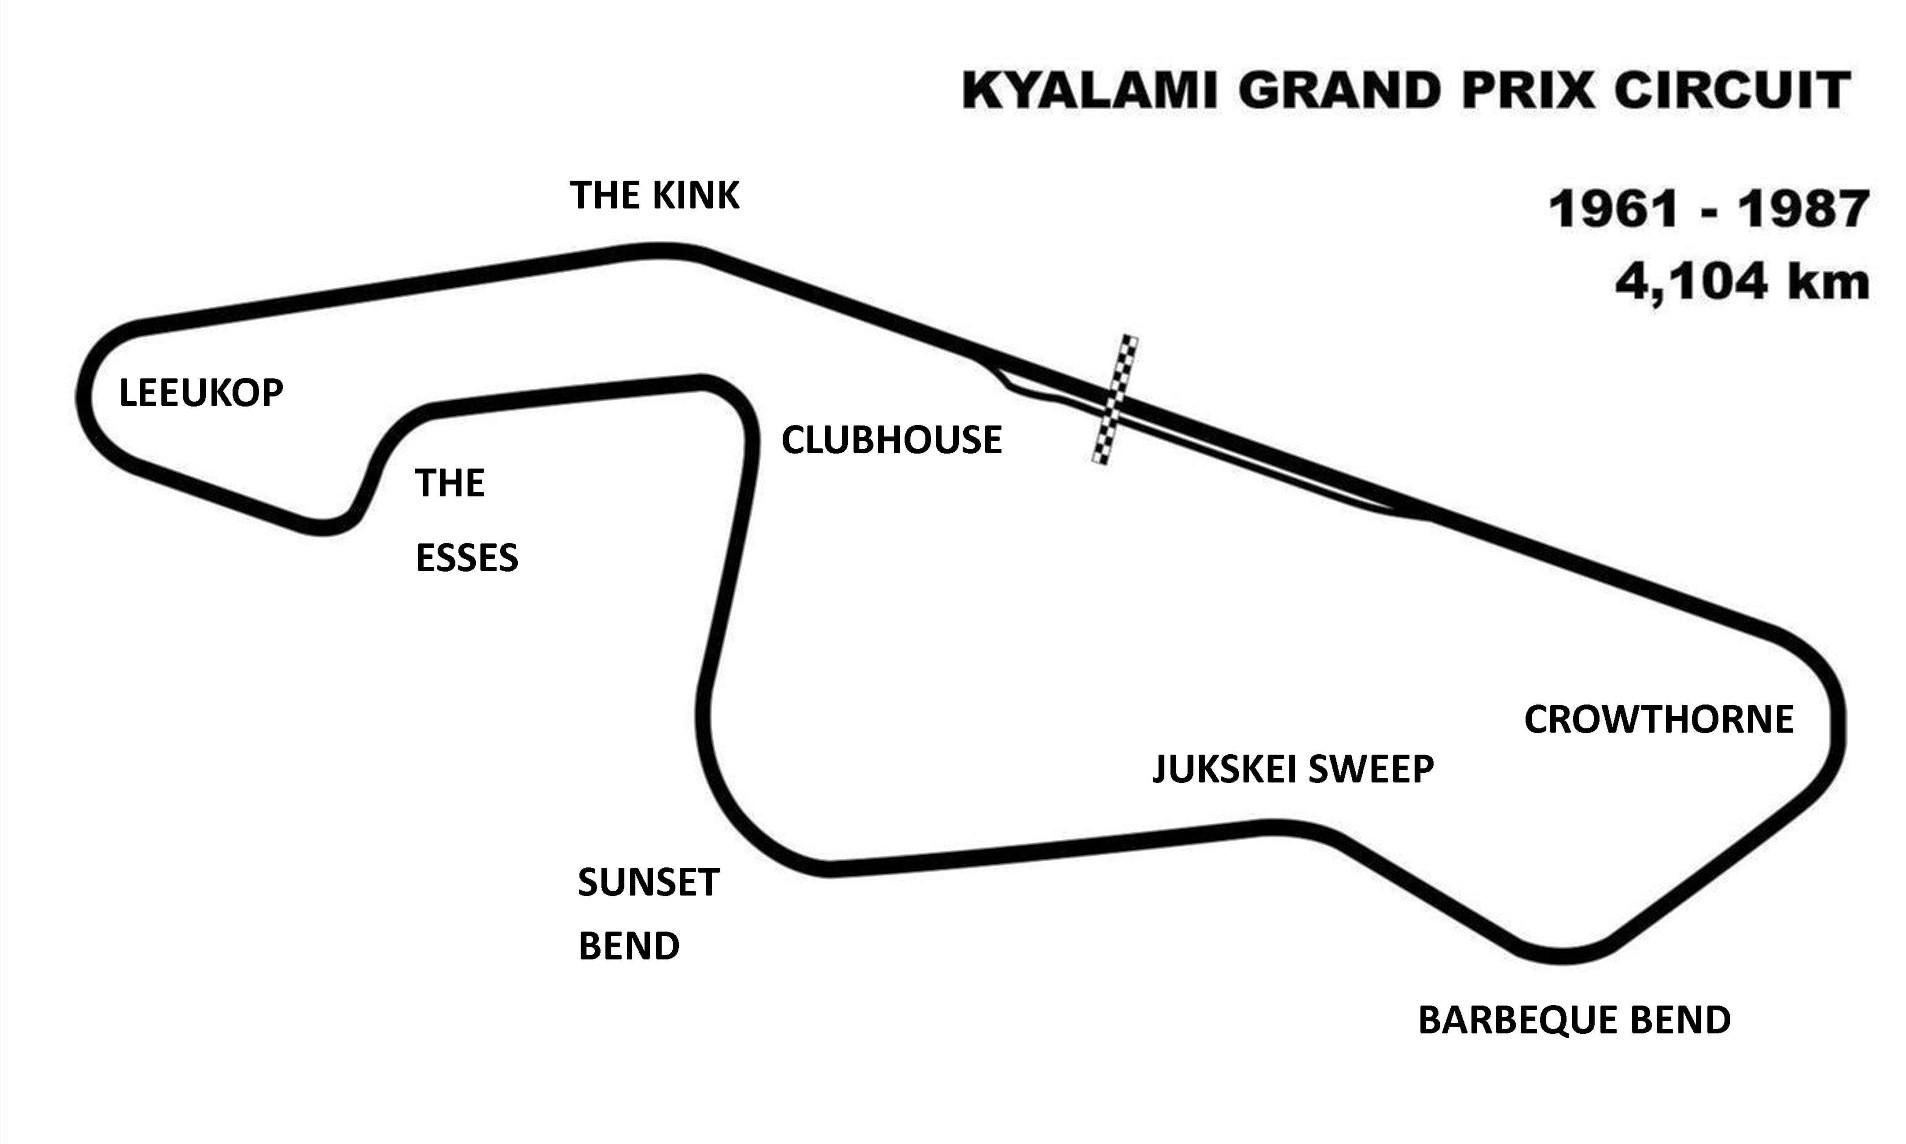 Original Kyalami